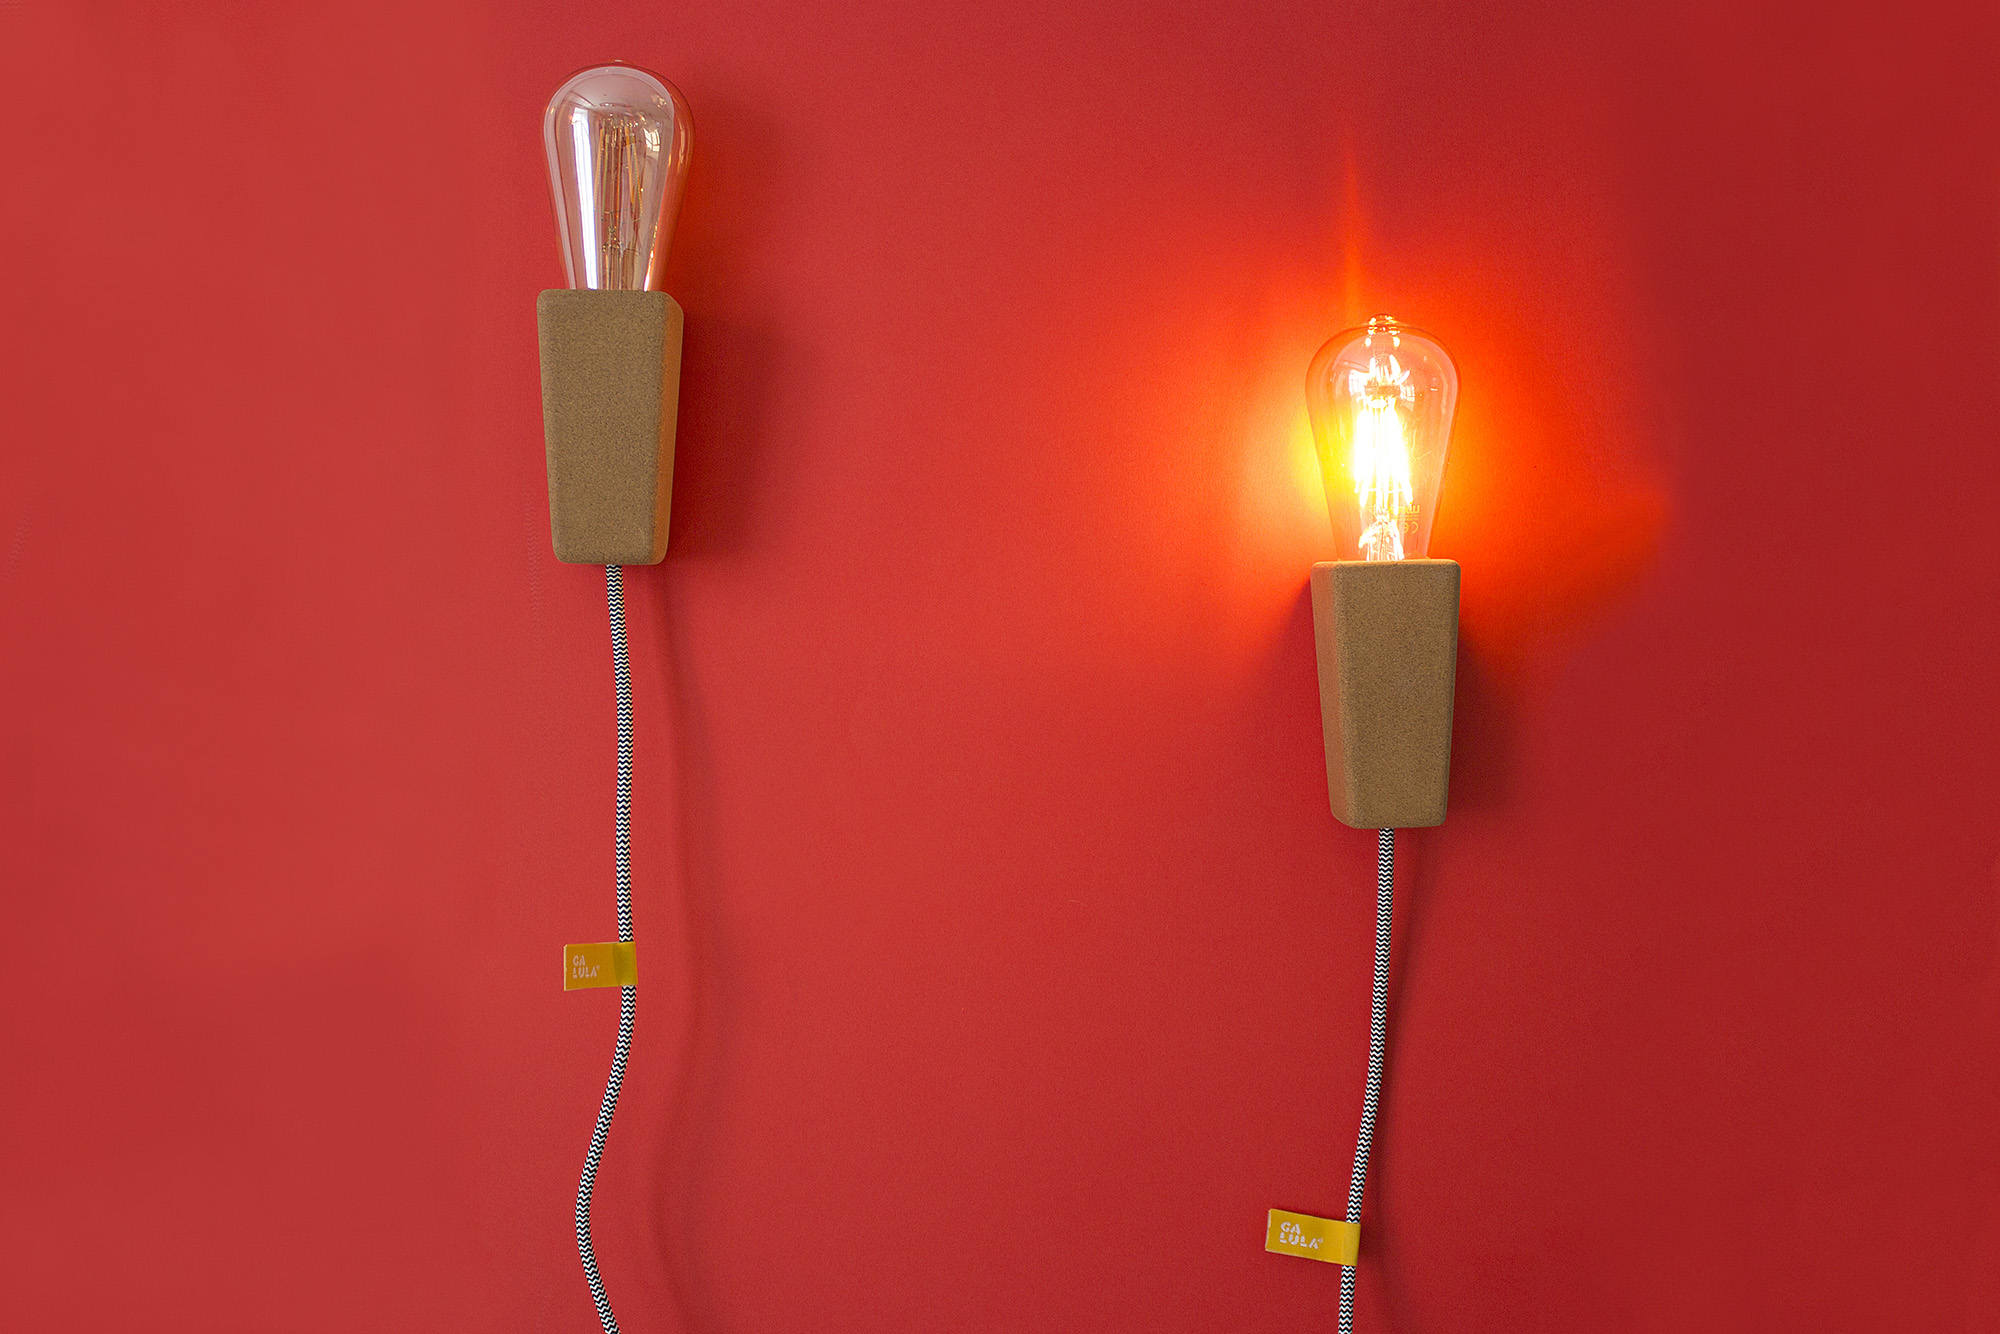 low-Galula-magneto-lamp-amb-09.jpg